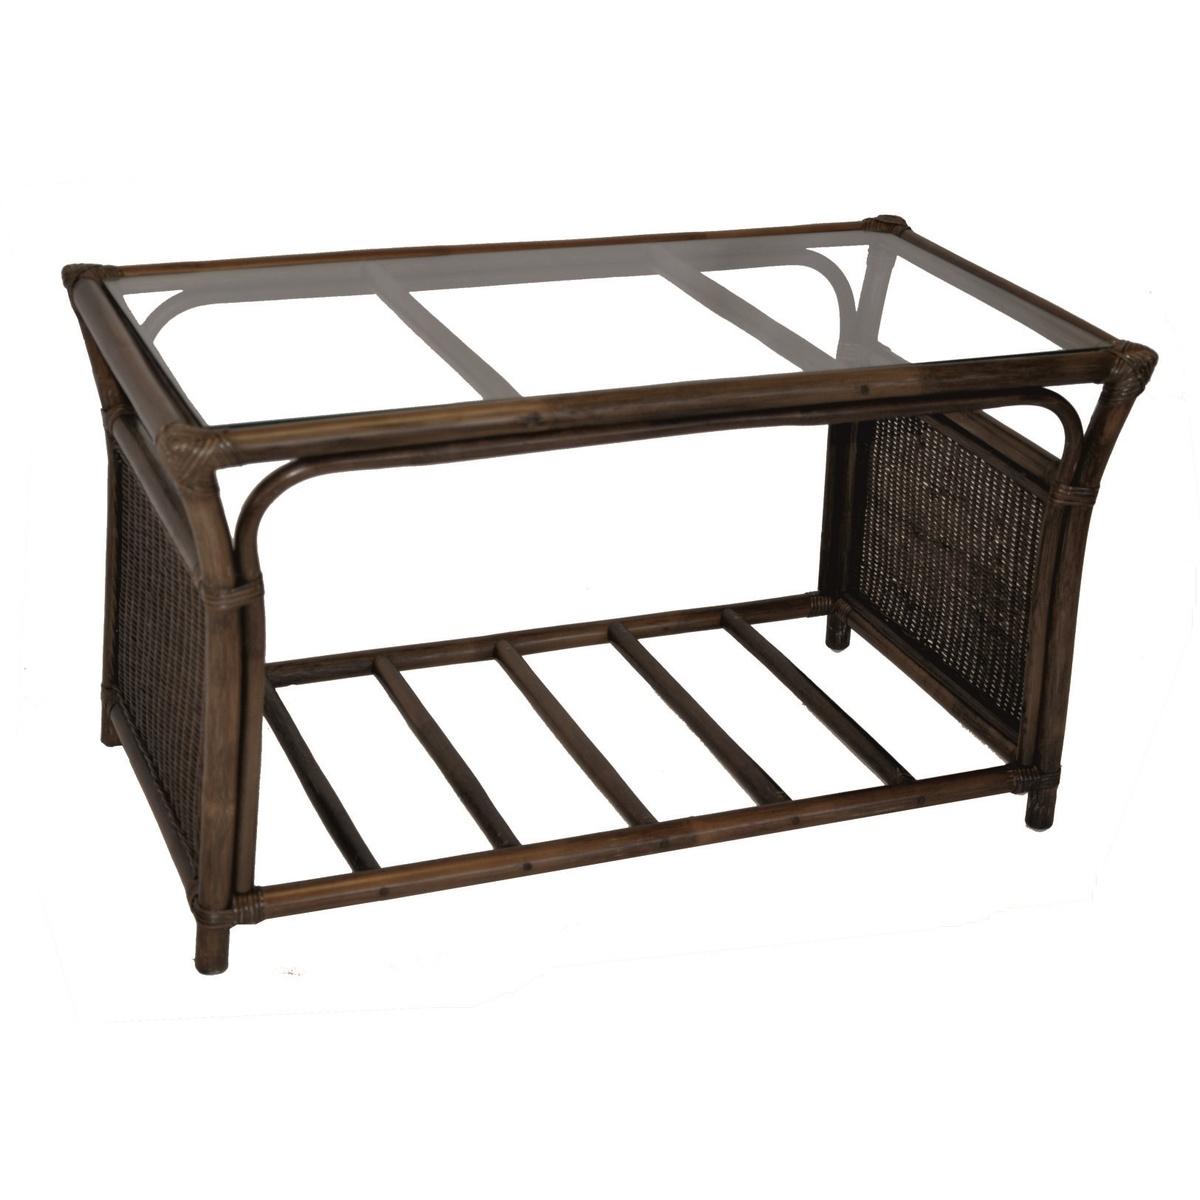 Ratanový stolík Oliver, tmavo hnedá